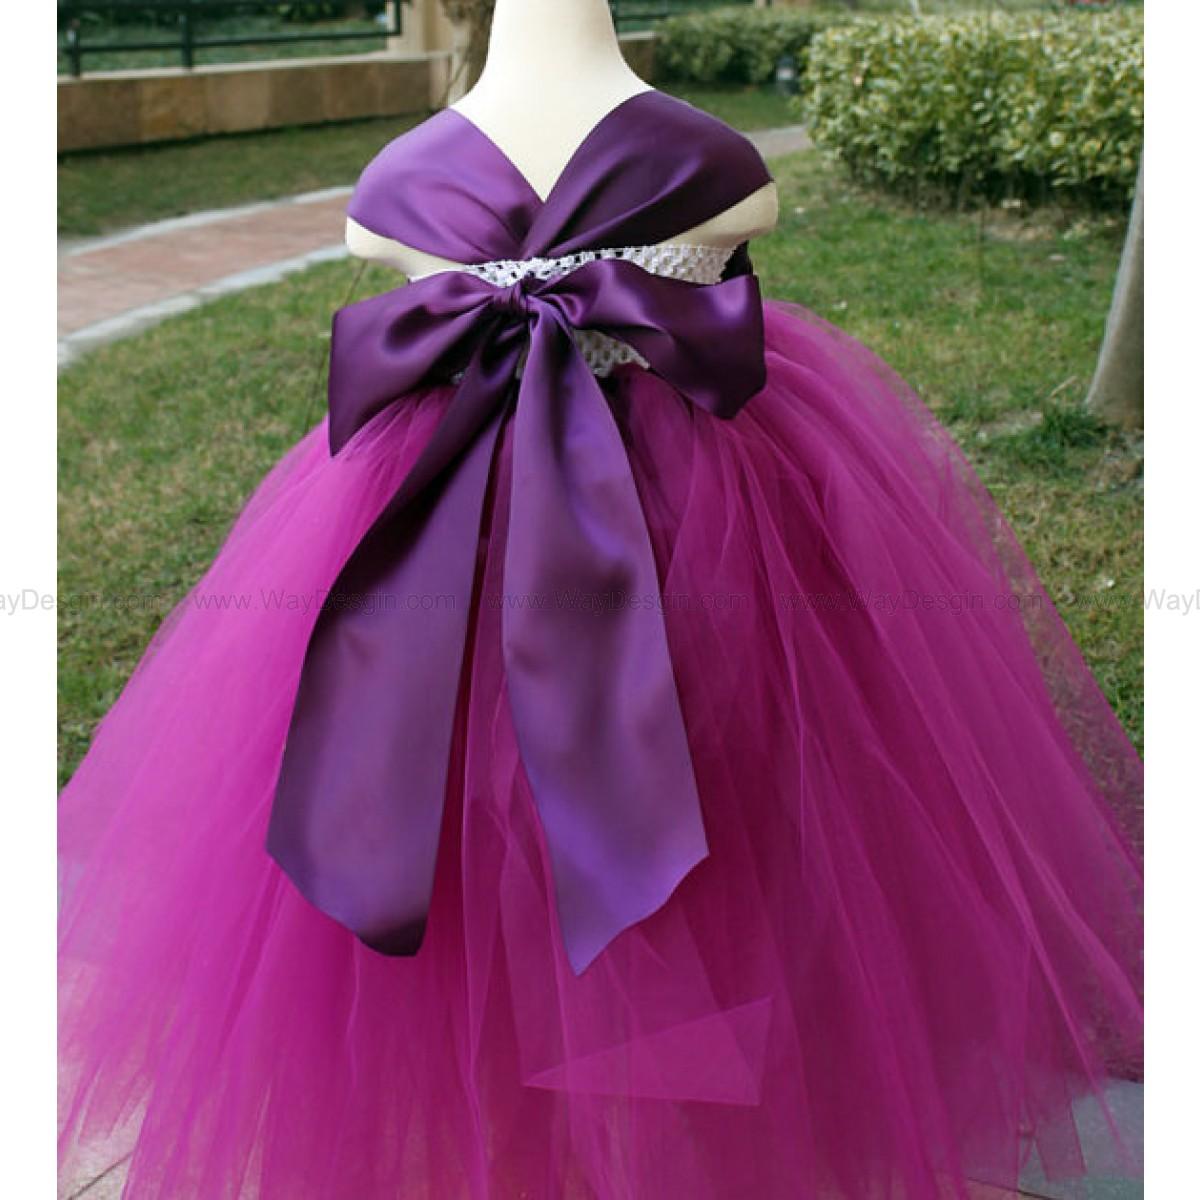 Flower Girl Dress Purple Plum tutu dress baby dress toddler birthday dress wedding dress